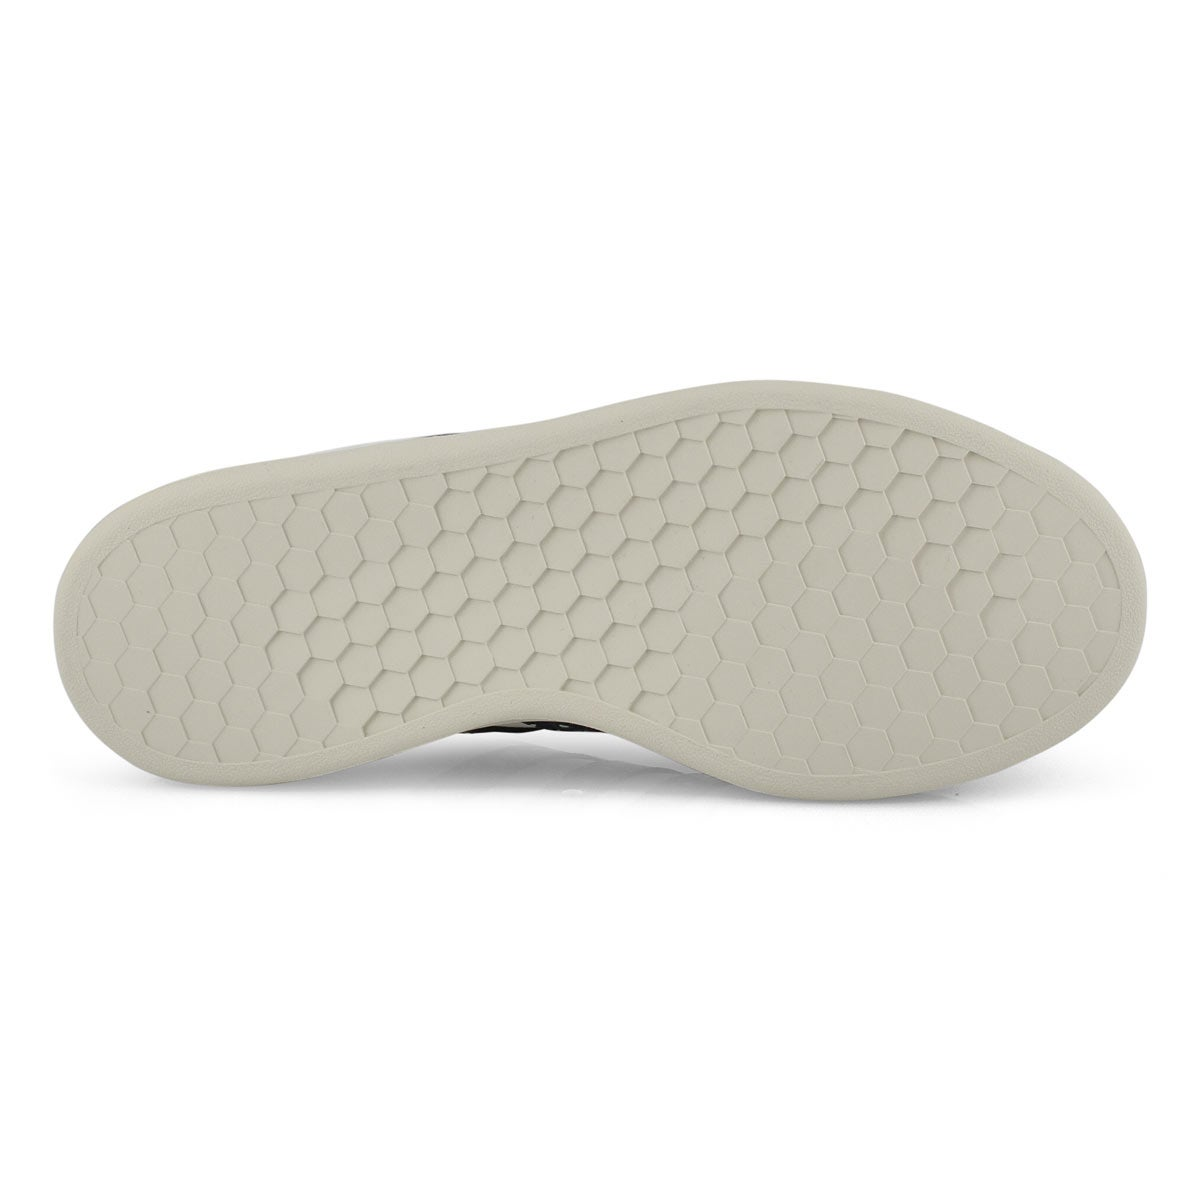 Women's Grand Court Sneaker - White/Grey/Ink